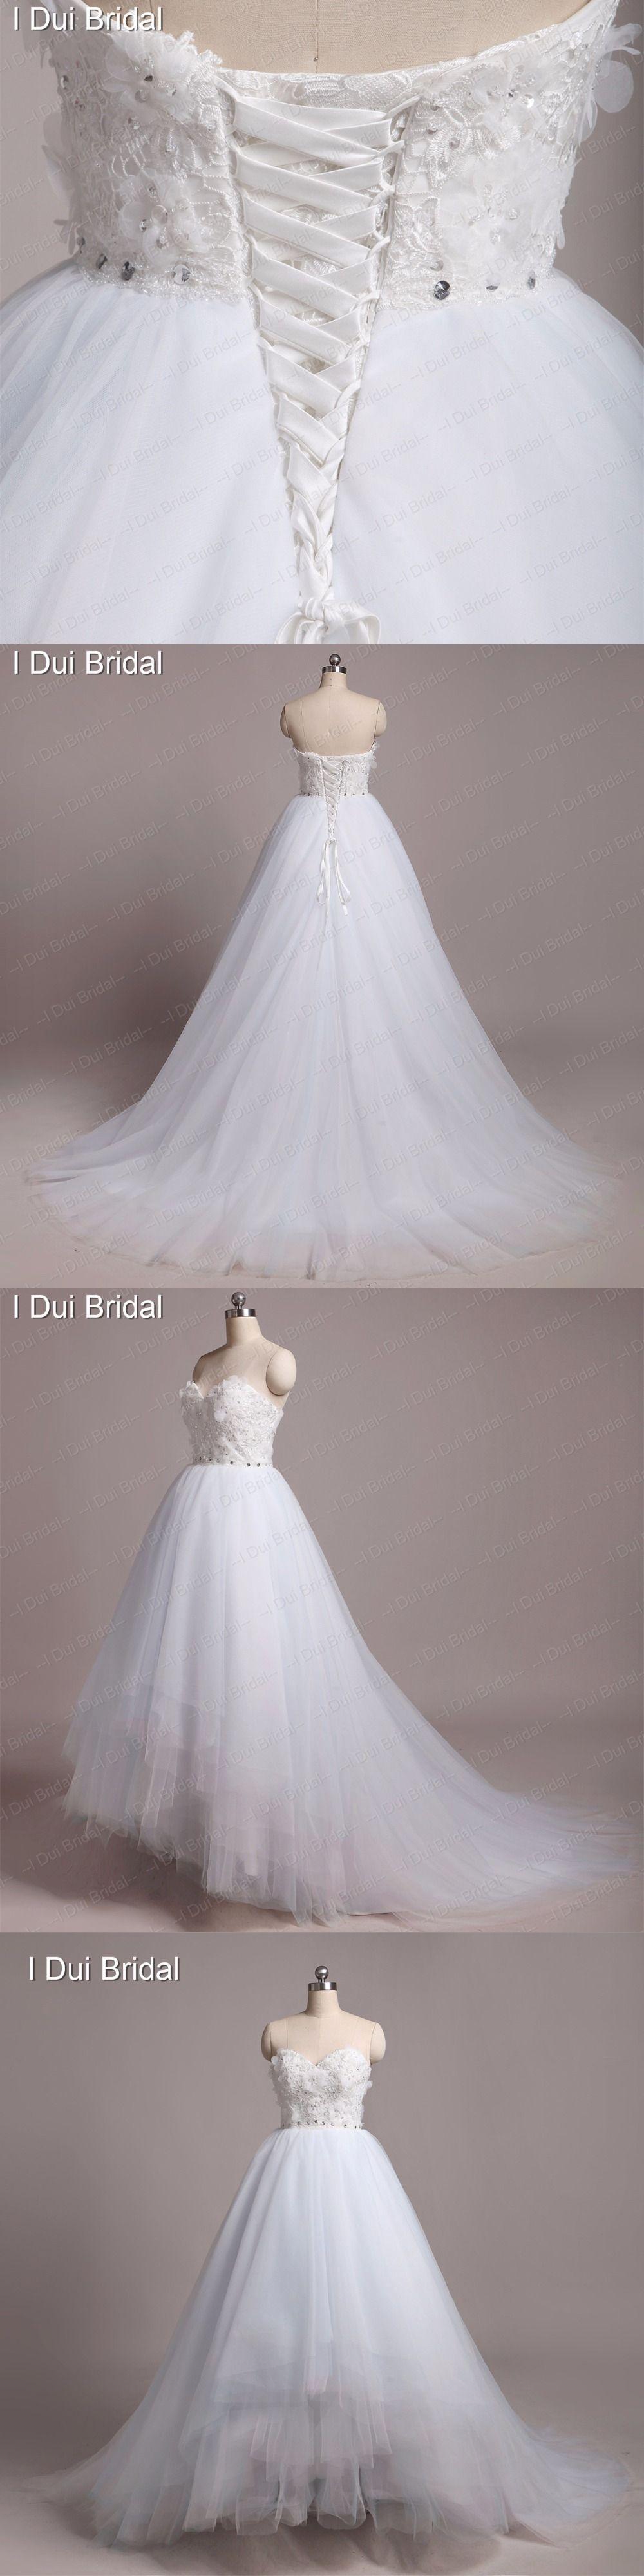 Light blue wedding dresses custom make high quality strapless